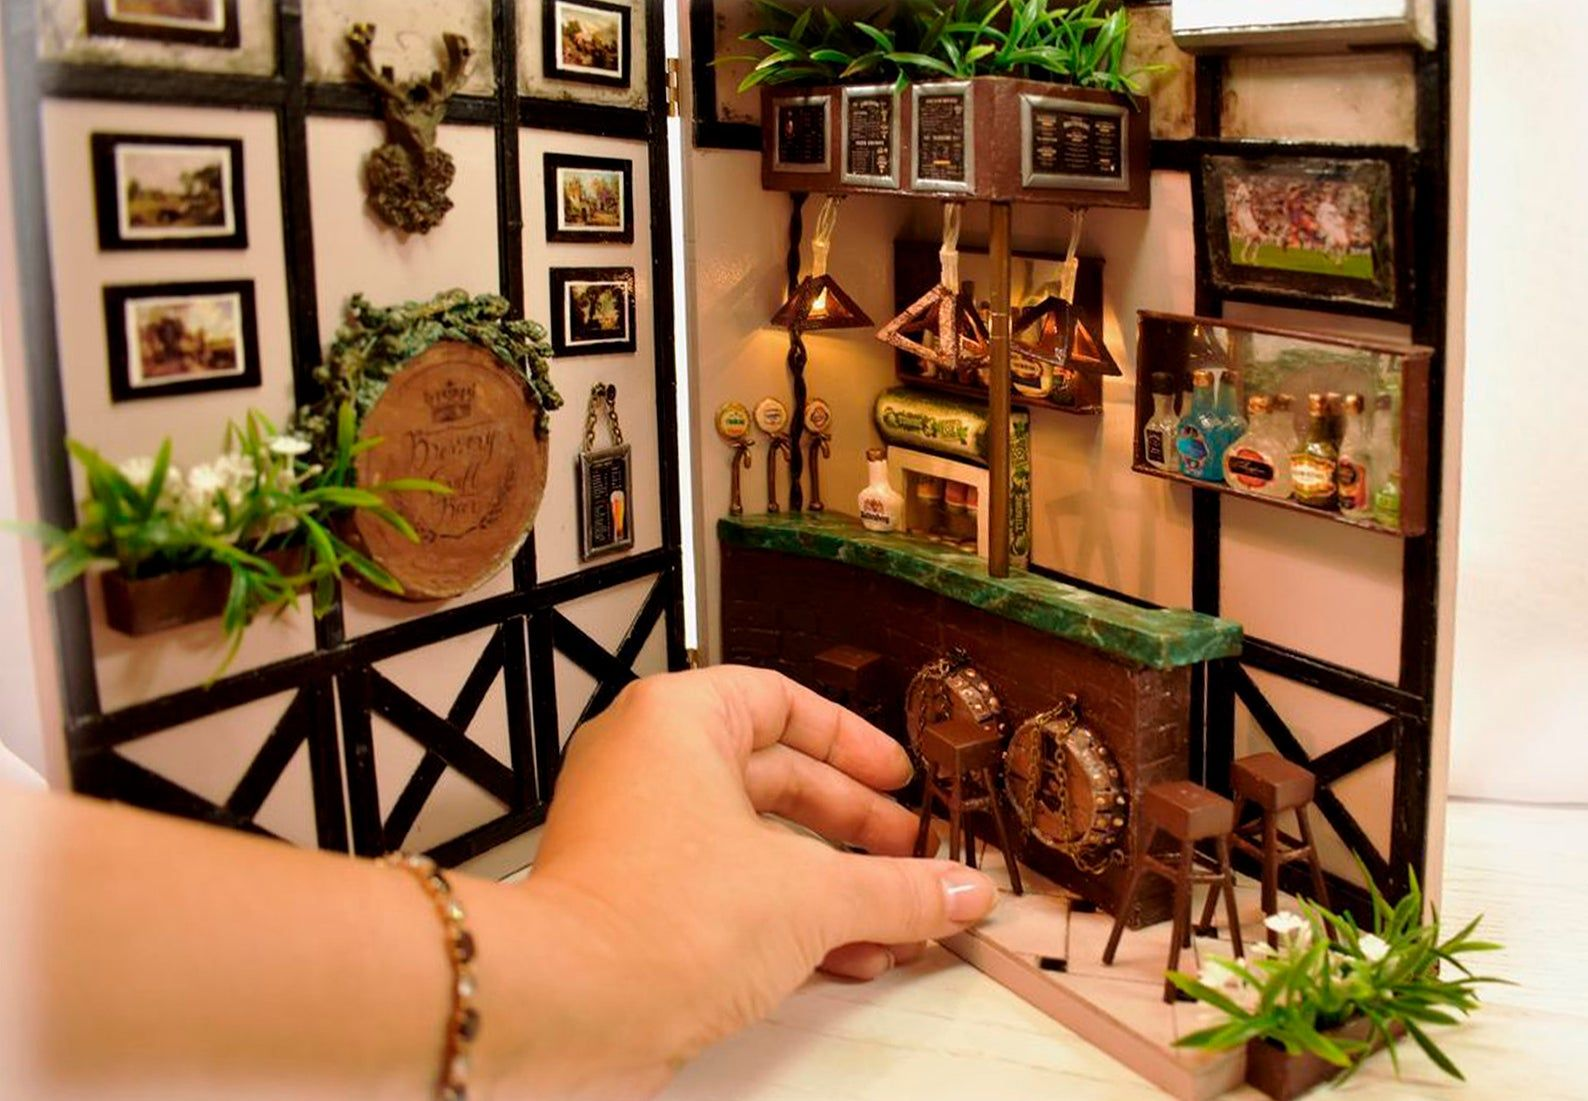 Bookshelf art book nook miniature beerbar miniature art